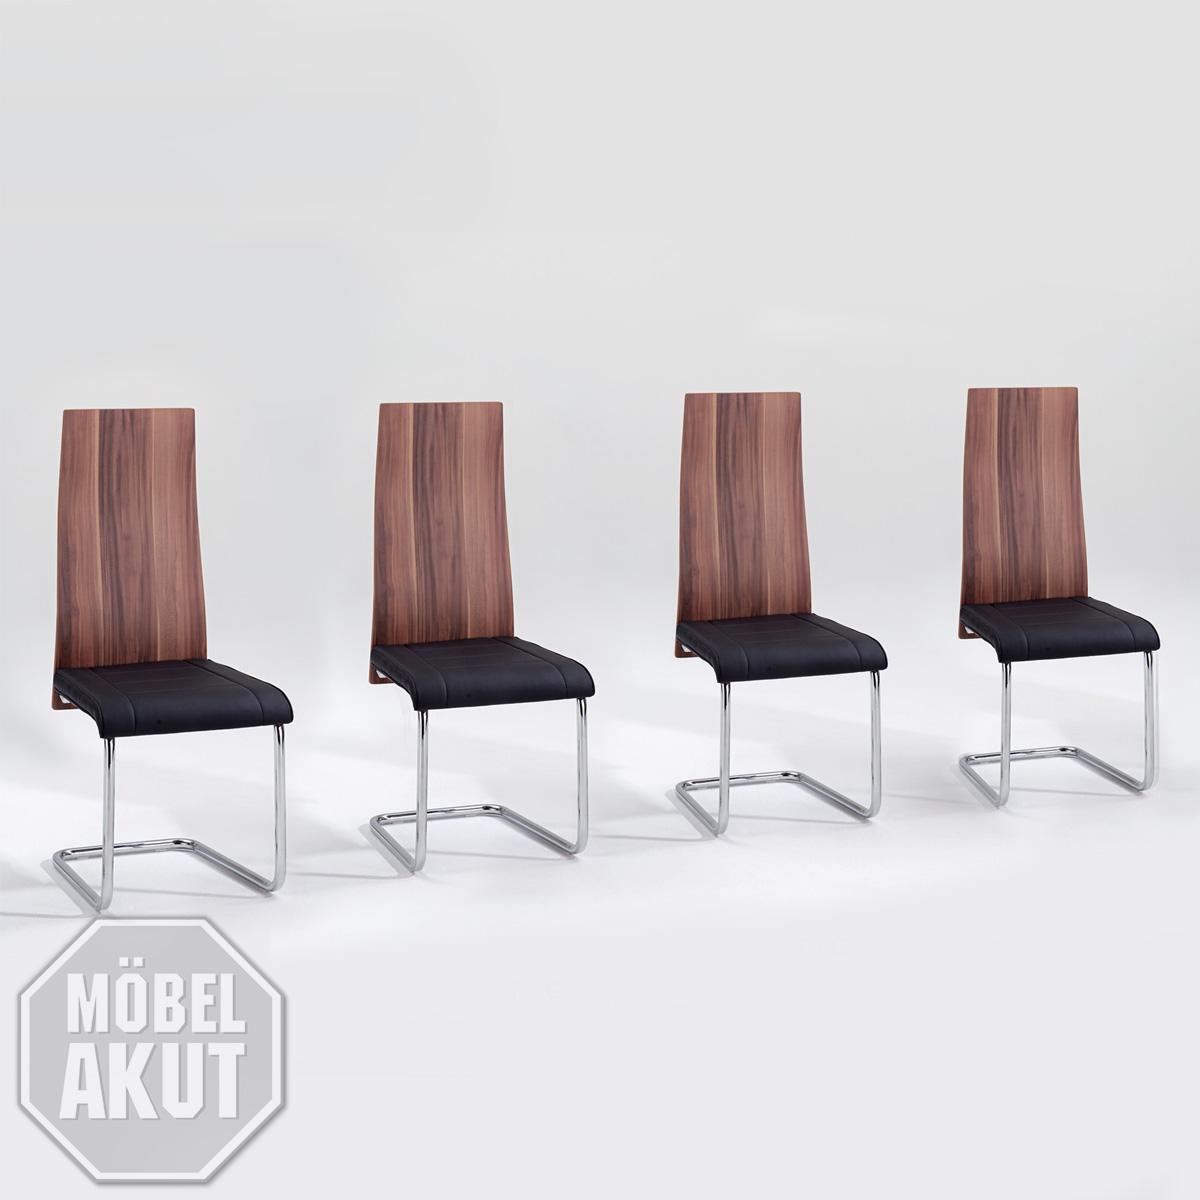 stuhl figo 4er set schwingstuhl schwinger in walnuss und schwarz ebay. Black Bedroom Furniture Sets. Home Design Ideas